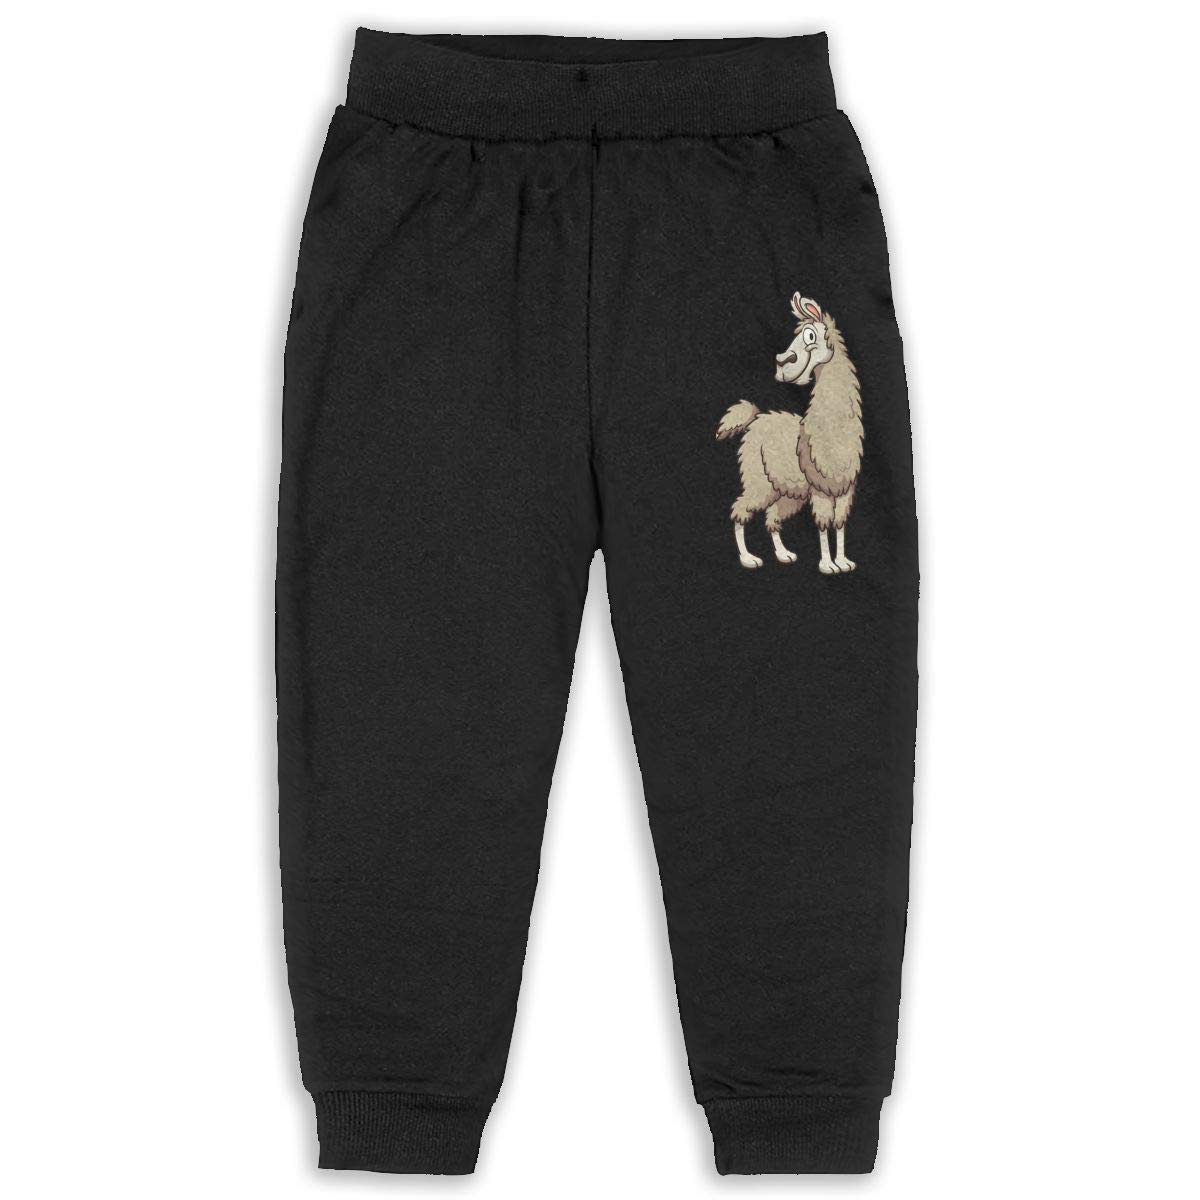 Unisex Kids No Prob Llama Fashion Sleep Sweatpants Black Gift with Pockets Pajamas